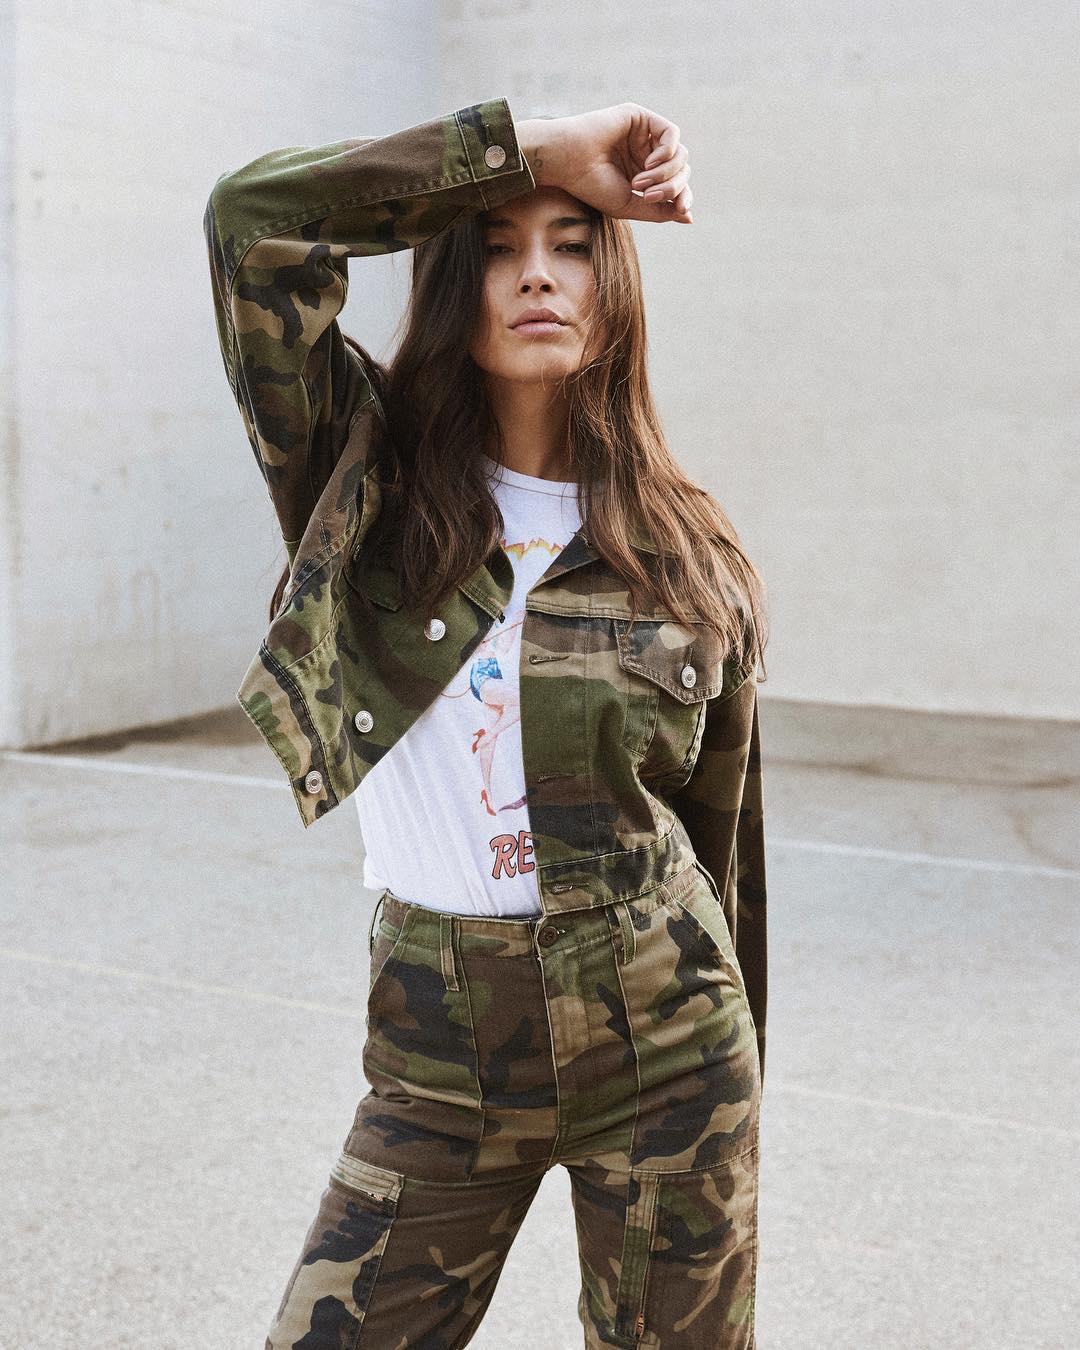 Jessica-Gomes-Wallpapers-Insta-Fit-Bio-2